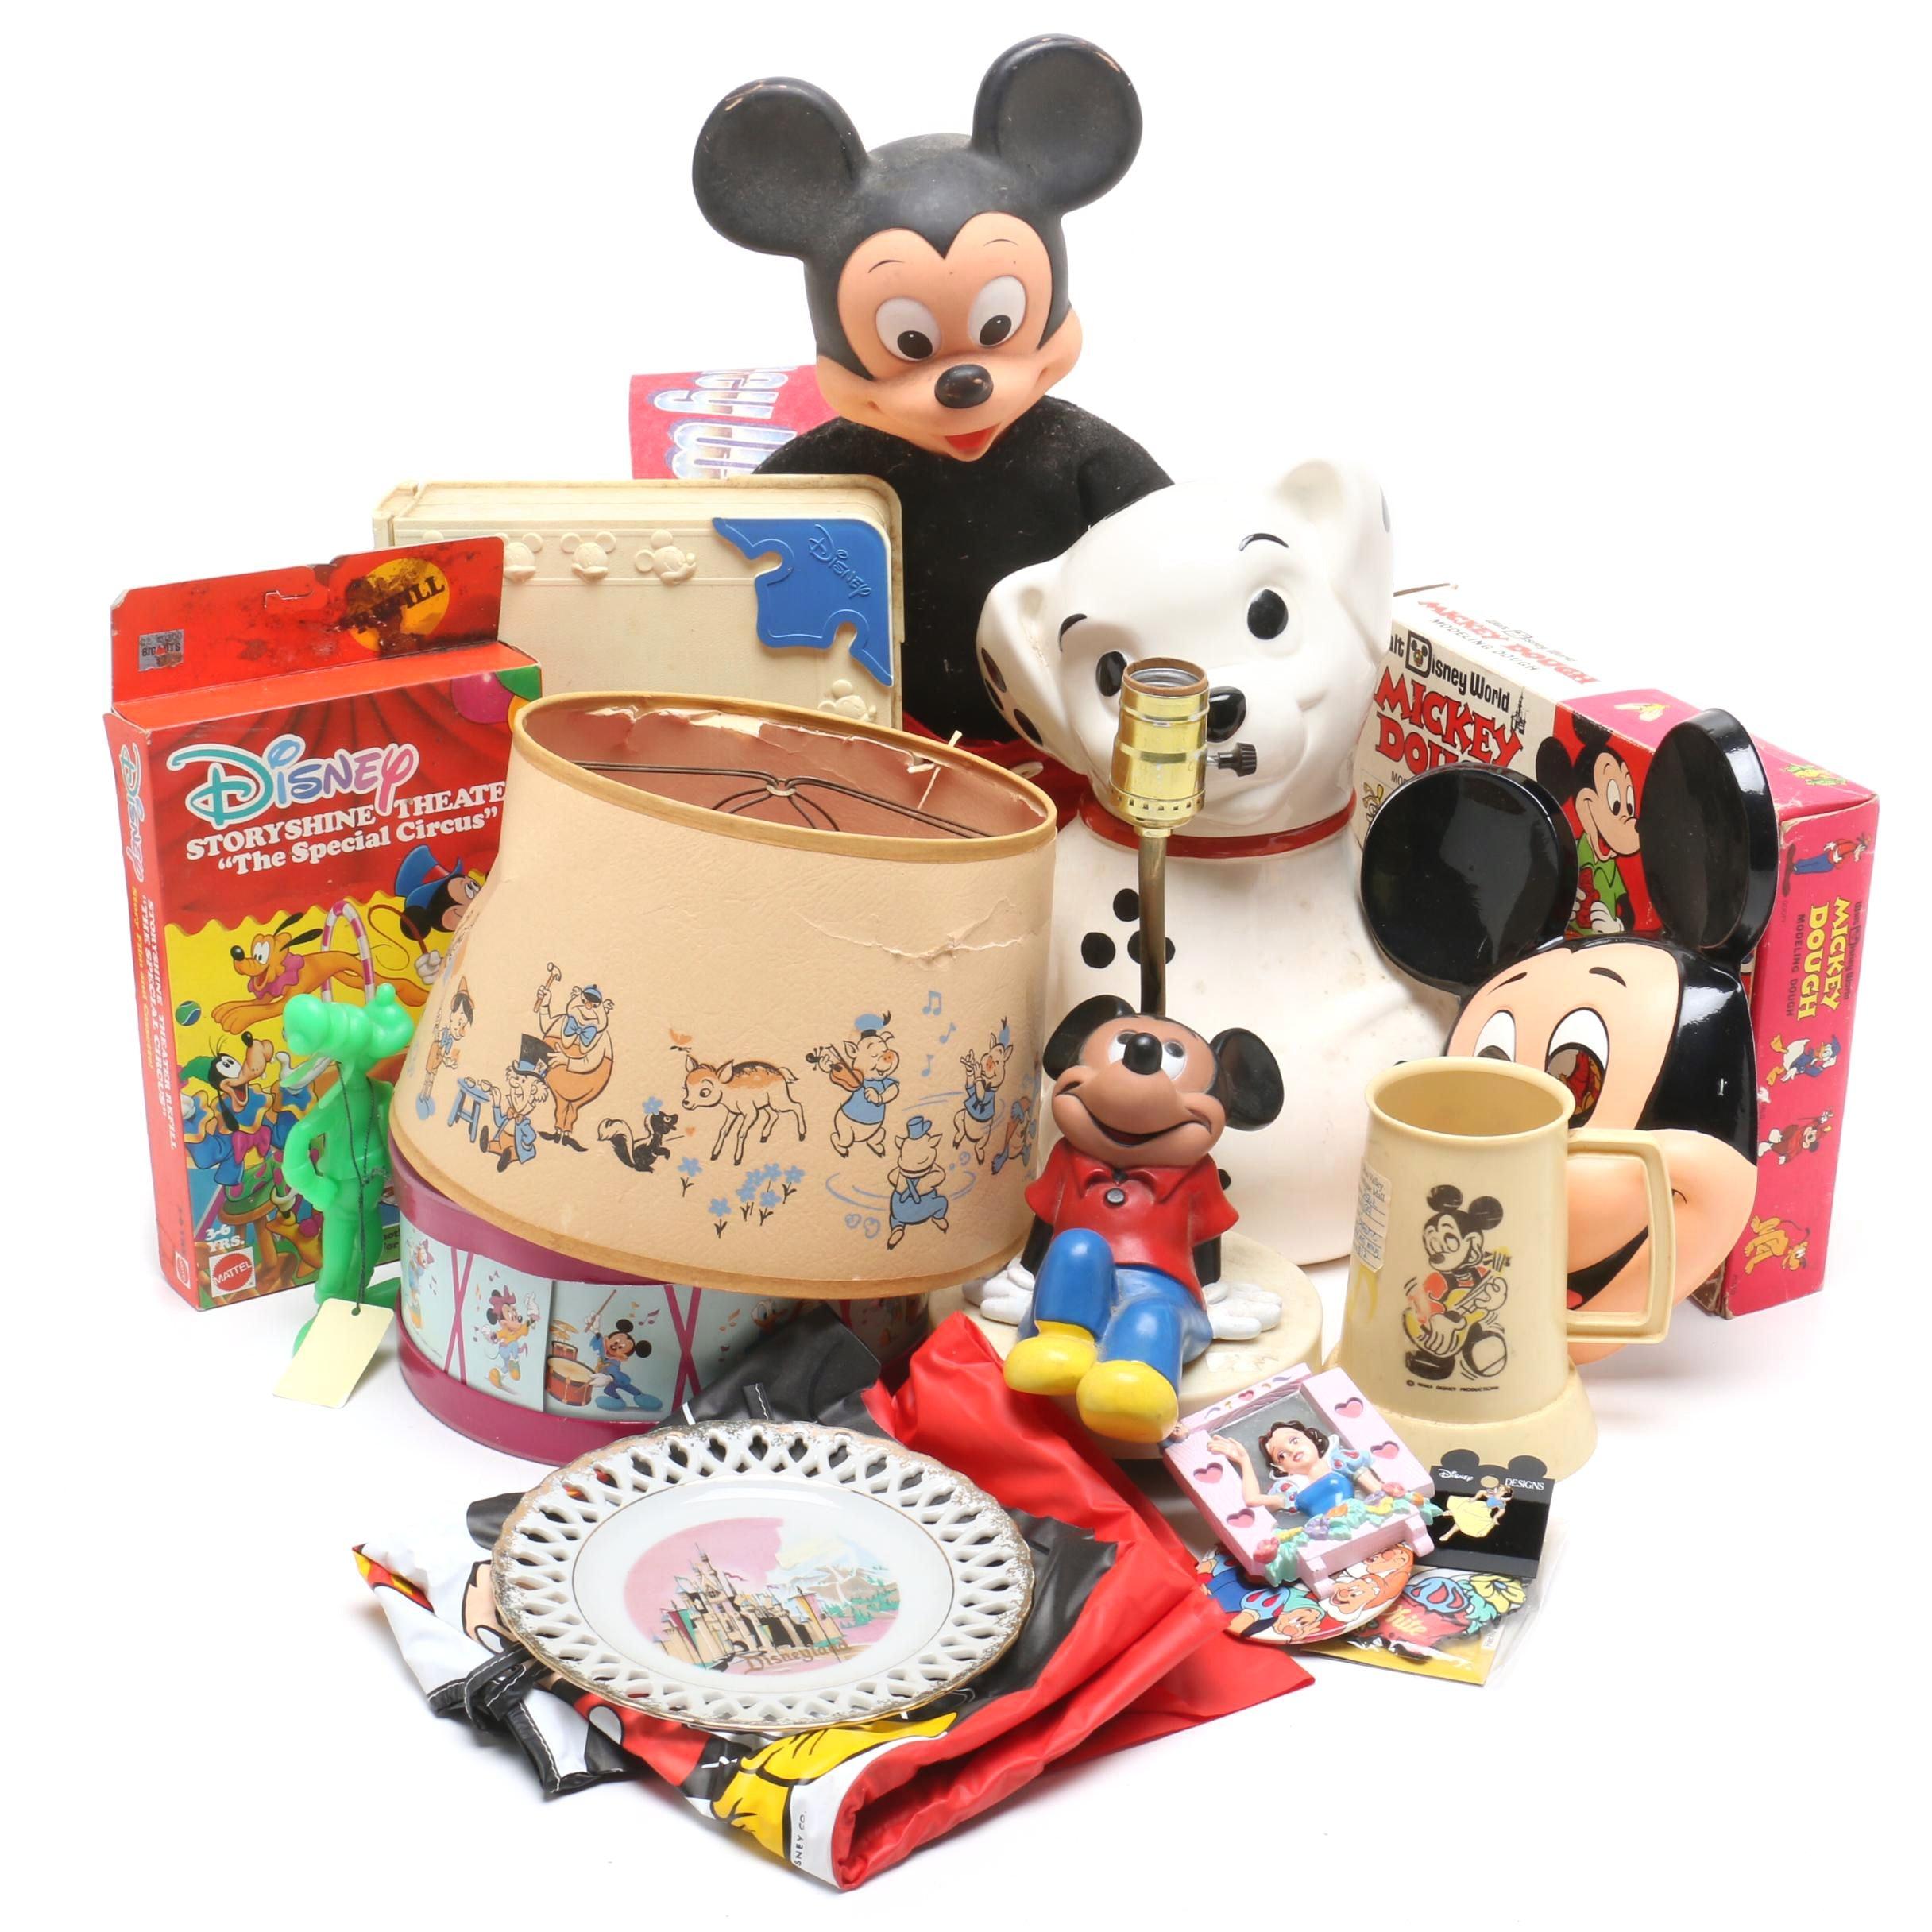 Vintage Disneyland and Walt Disney World Souvenirs